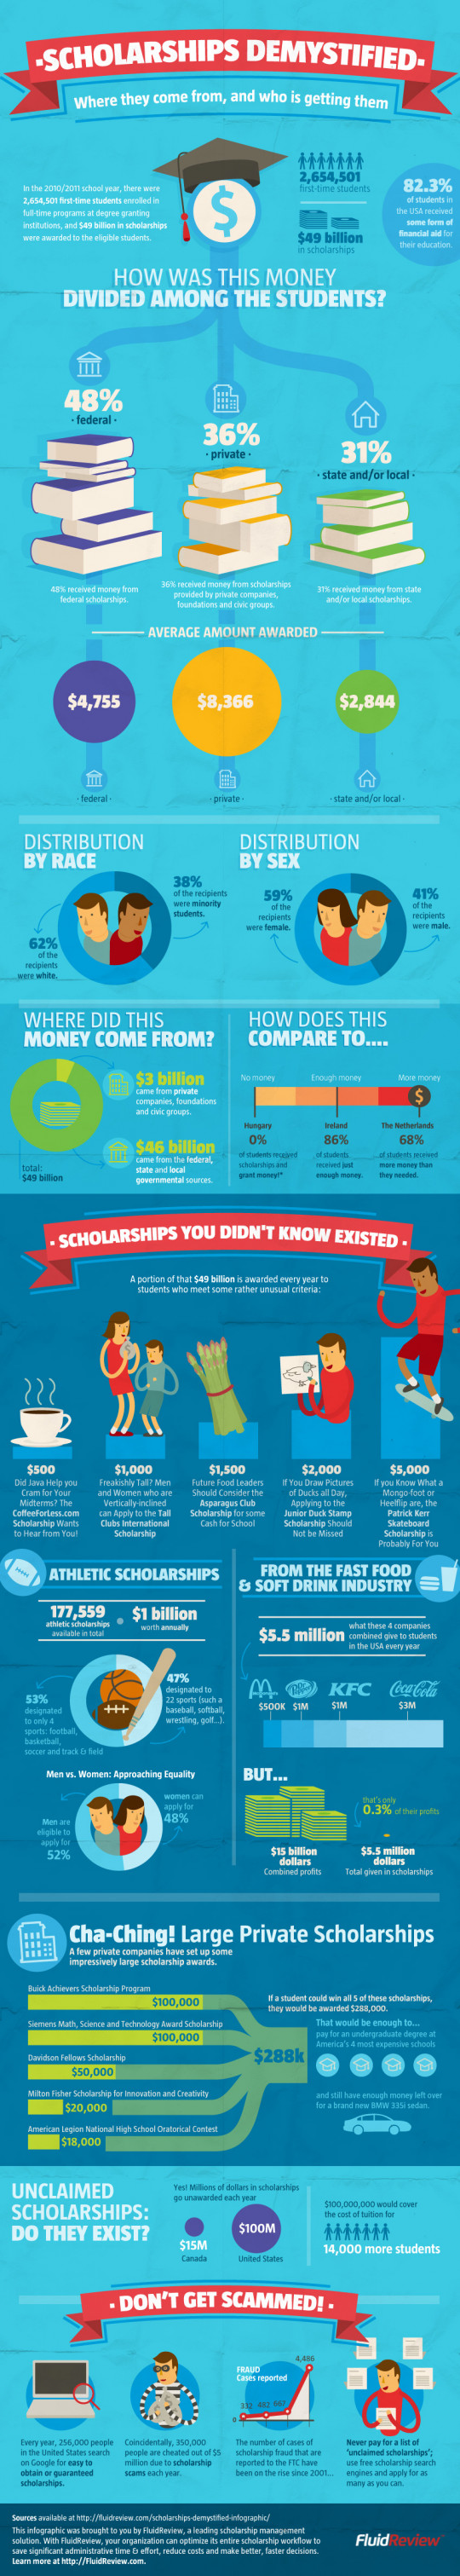 110452? w=540 - Brilliant scholarship opportunities